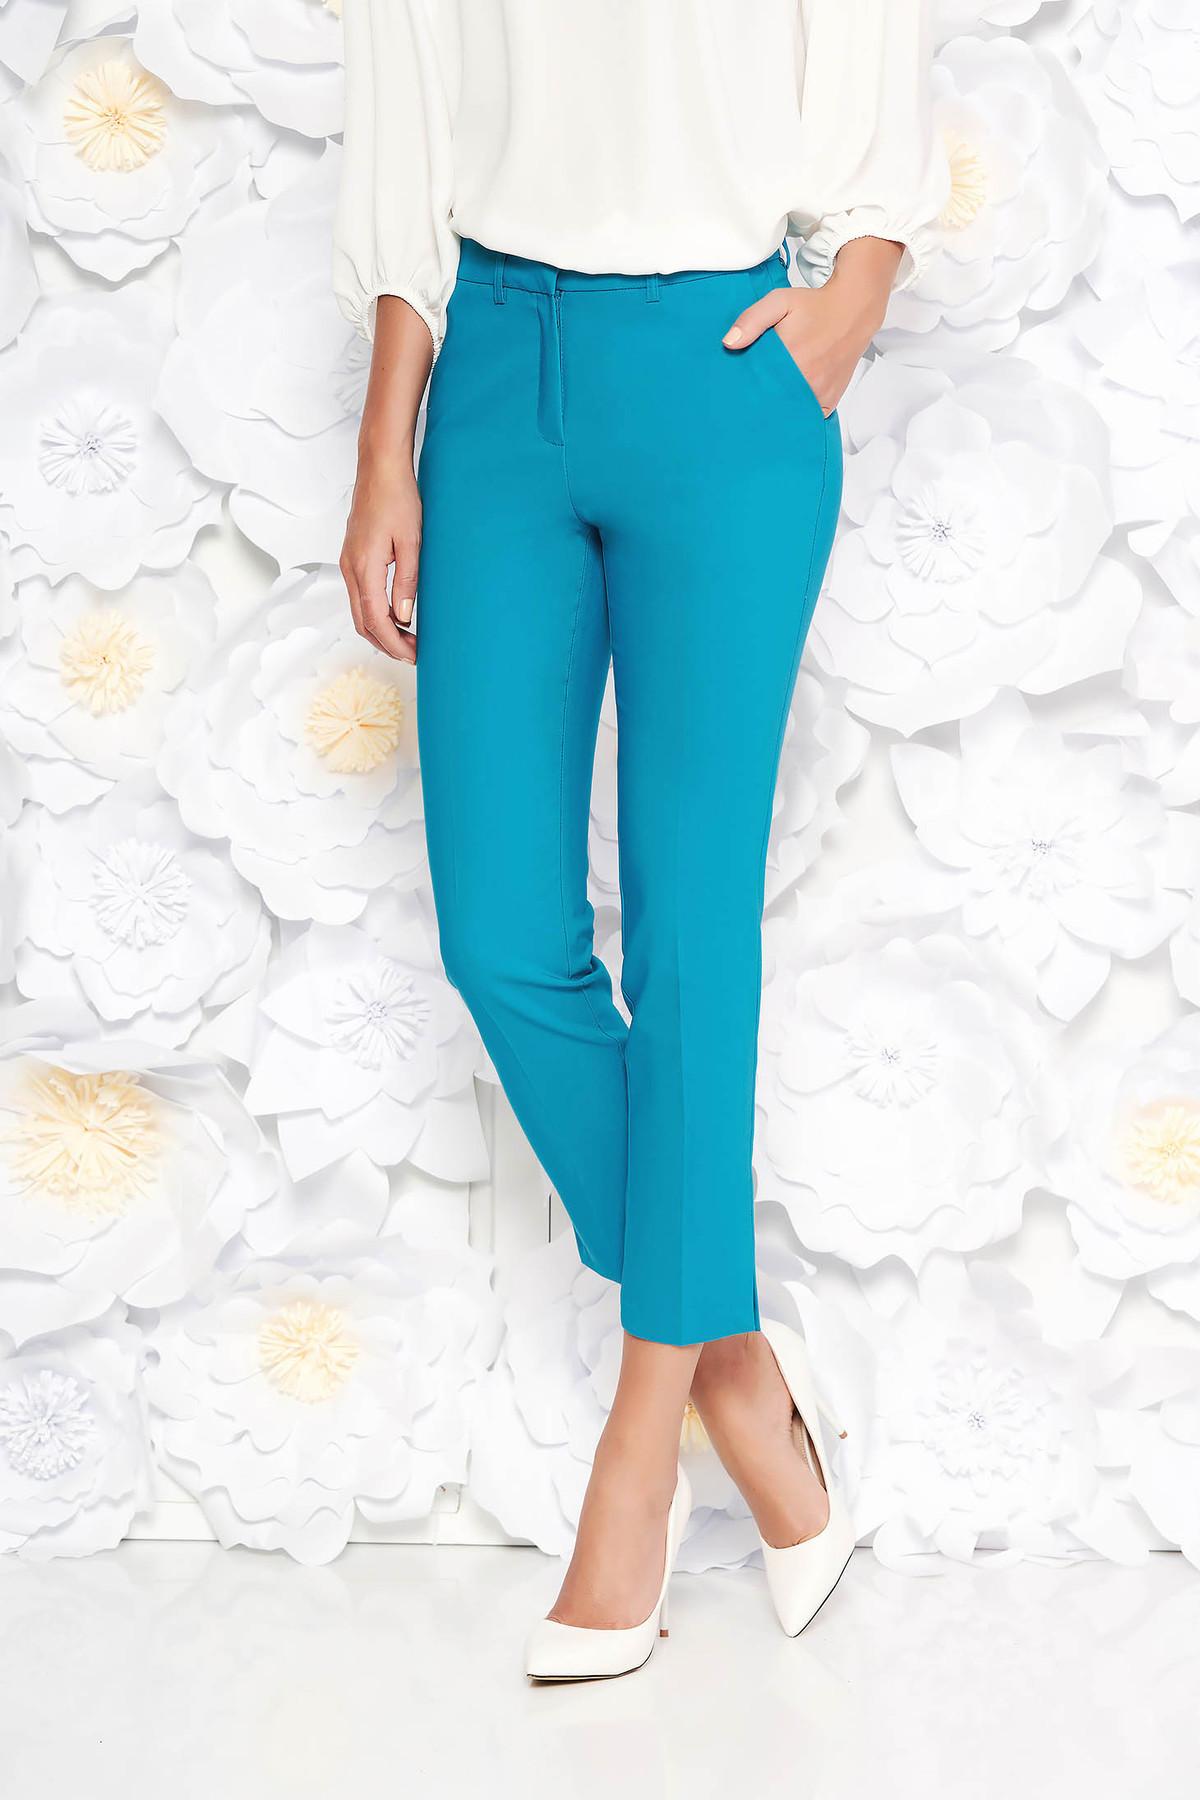 Pantaloni turcoaz eleganti cu talie medie din bumbac usor elastic